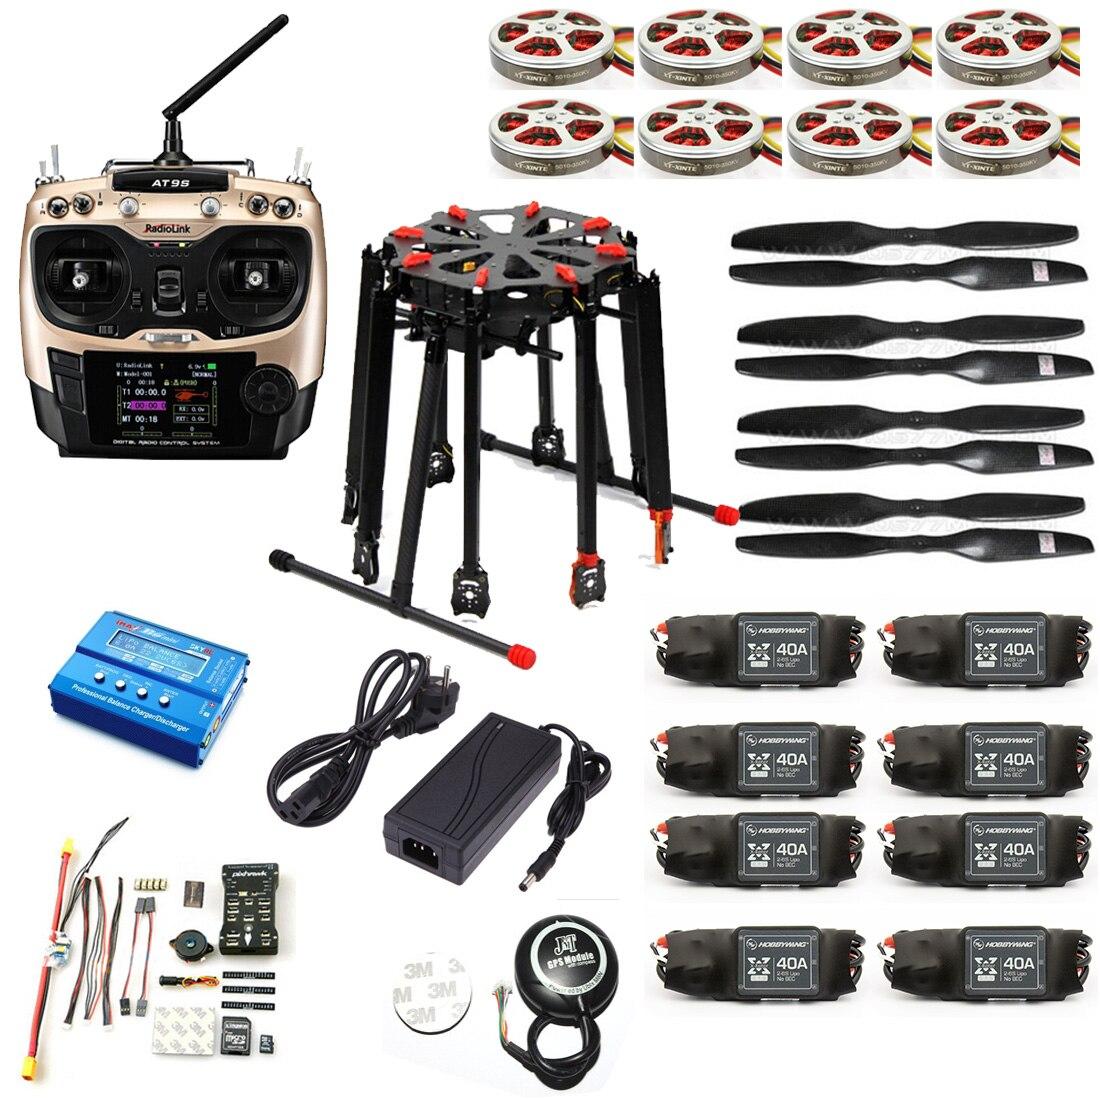 DIY GPS Drone Tarot X8 TL8X000 8-Axis Folding Frame 350KV 40A PX4 32 Bits Flight Controller Radiolink AT9S Transmitter F11270-DE f11270 tarot x8 8 aixs umbrella type folding multicopter uav octocopter drone tl8x000 with retractable landing gear